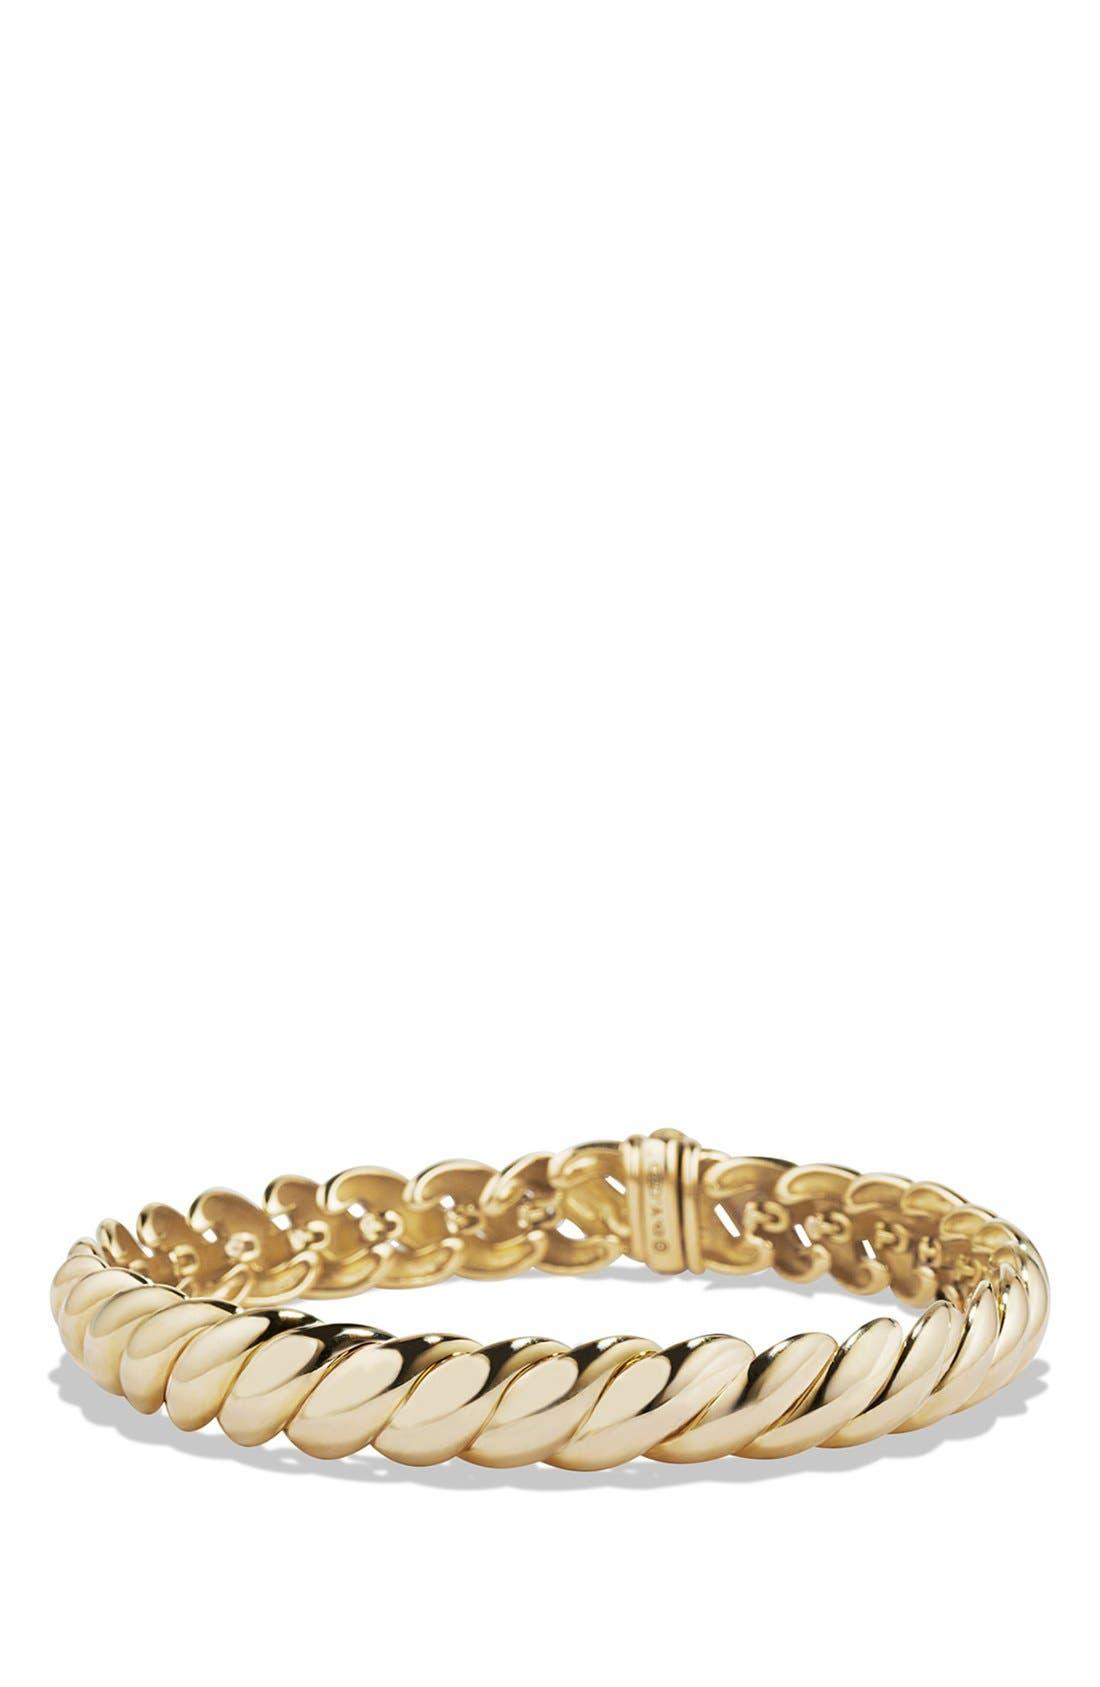 Main Image - David Yurman 'Hampton Cable' Link Bracelet in Gold